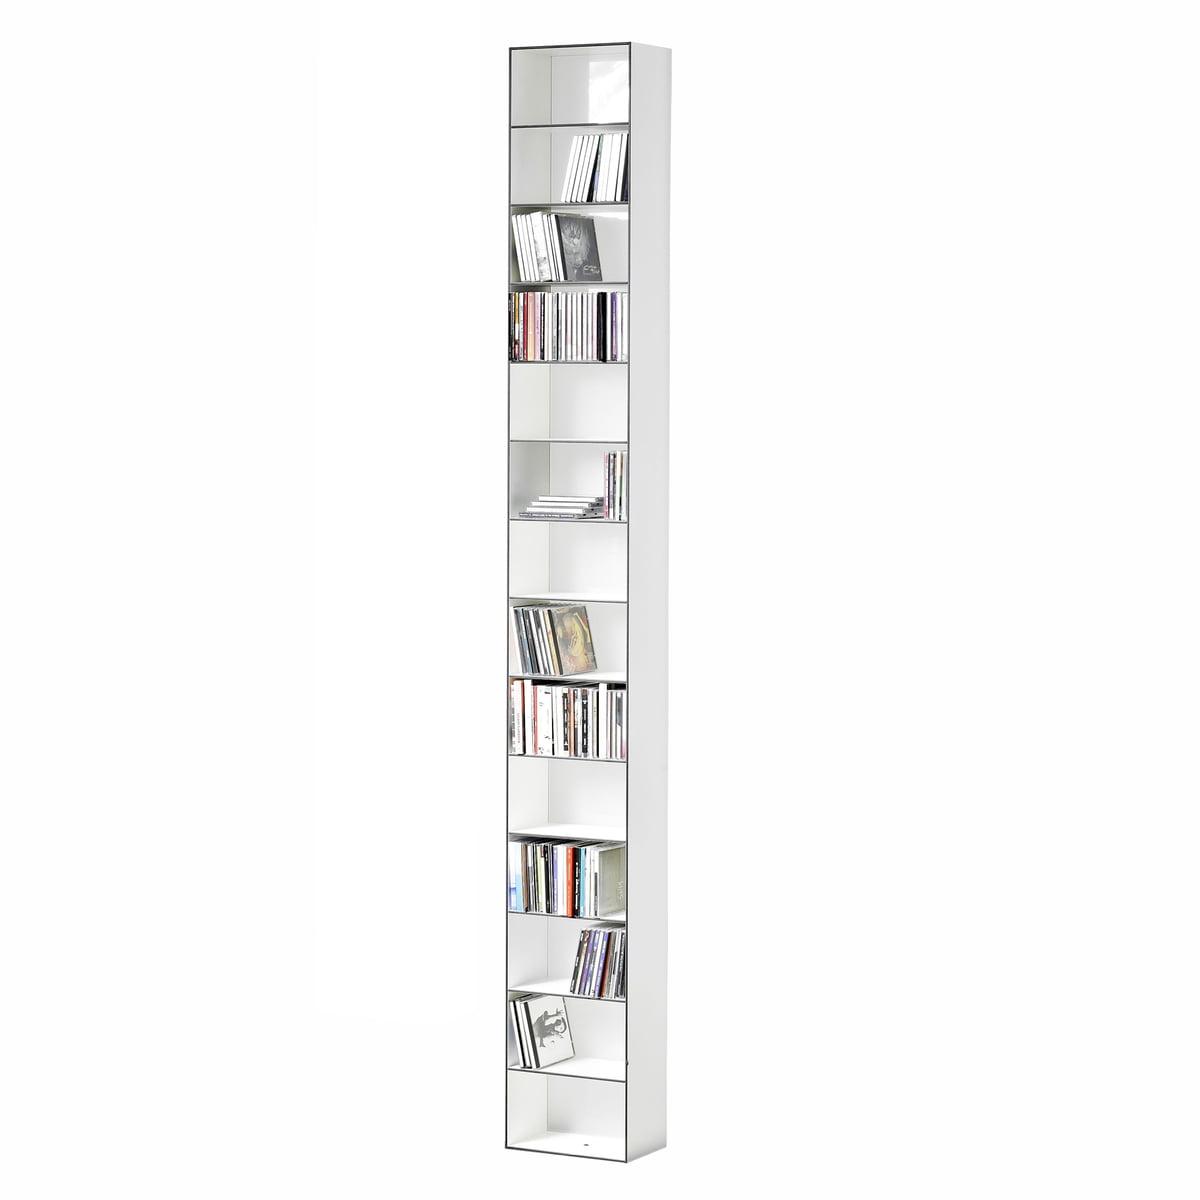 25 CD-Regal, 26 x 15 cm, weiß